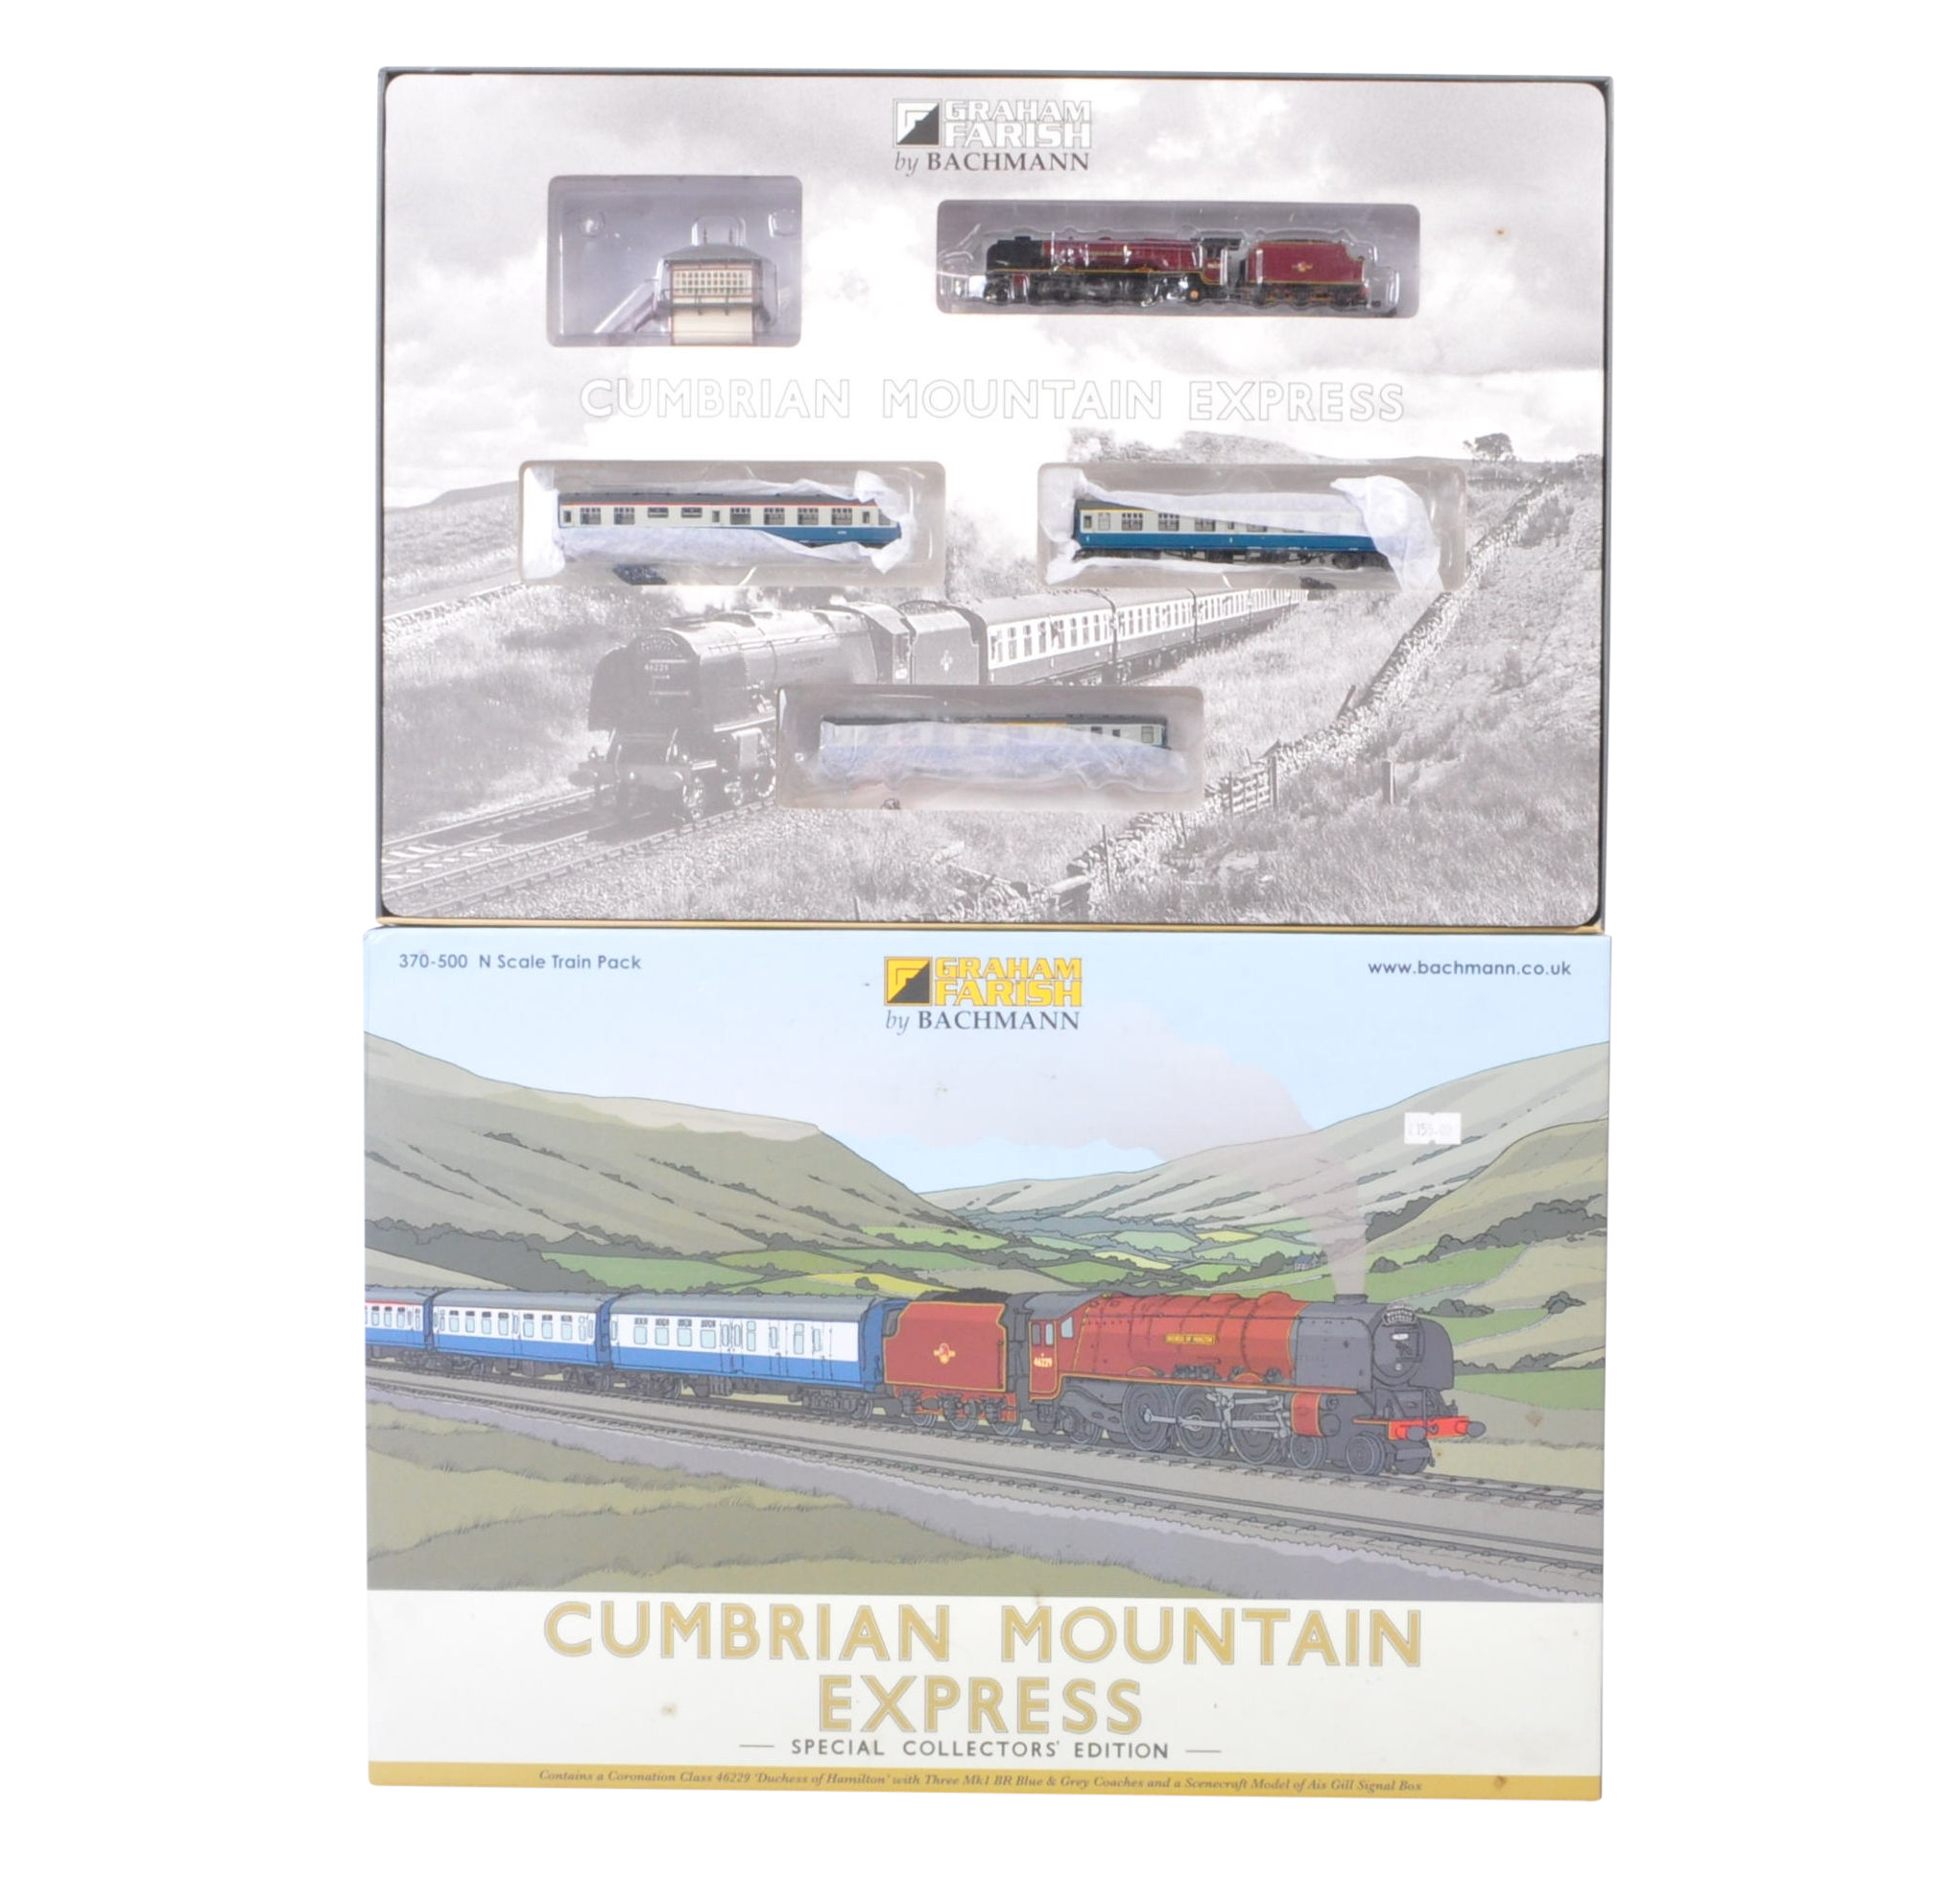 ORIGINAL BOXED GRAHAM FARISH CUMBRIAN MOUNTAIN EXPRESS TRAINSET